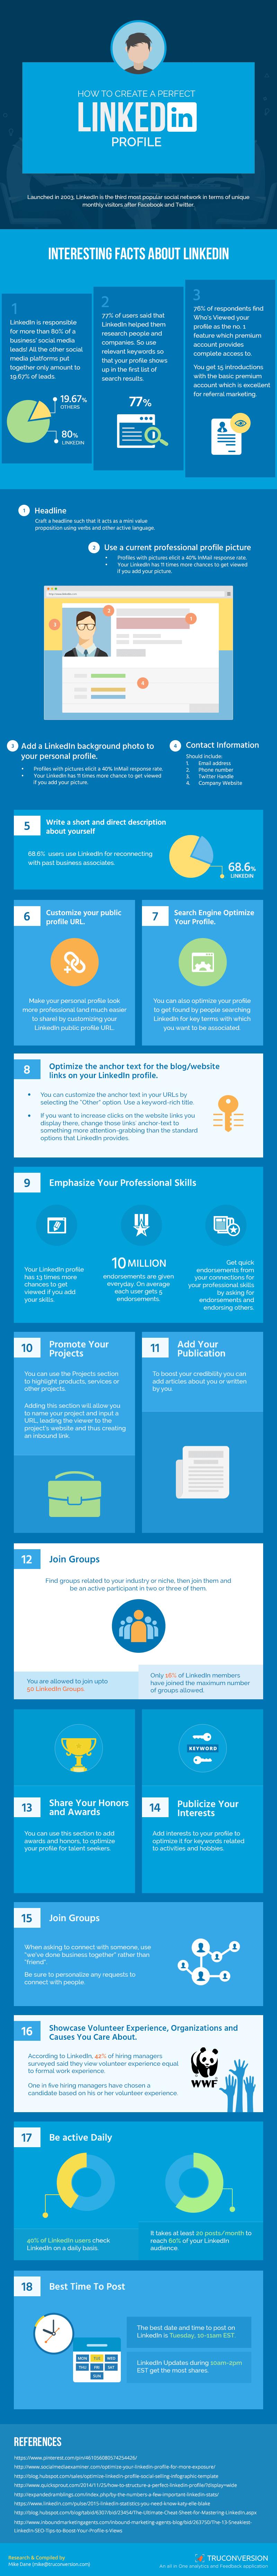 How to Create a Perfect LinkedIn Profile